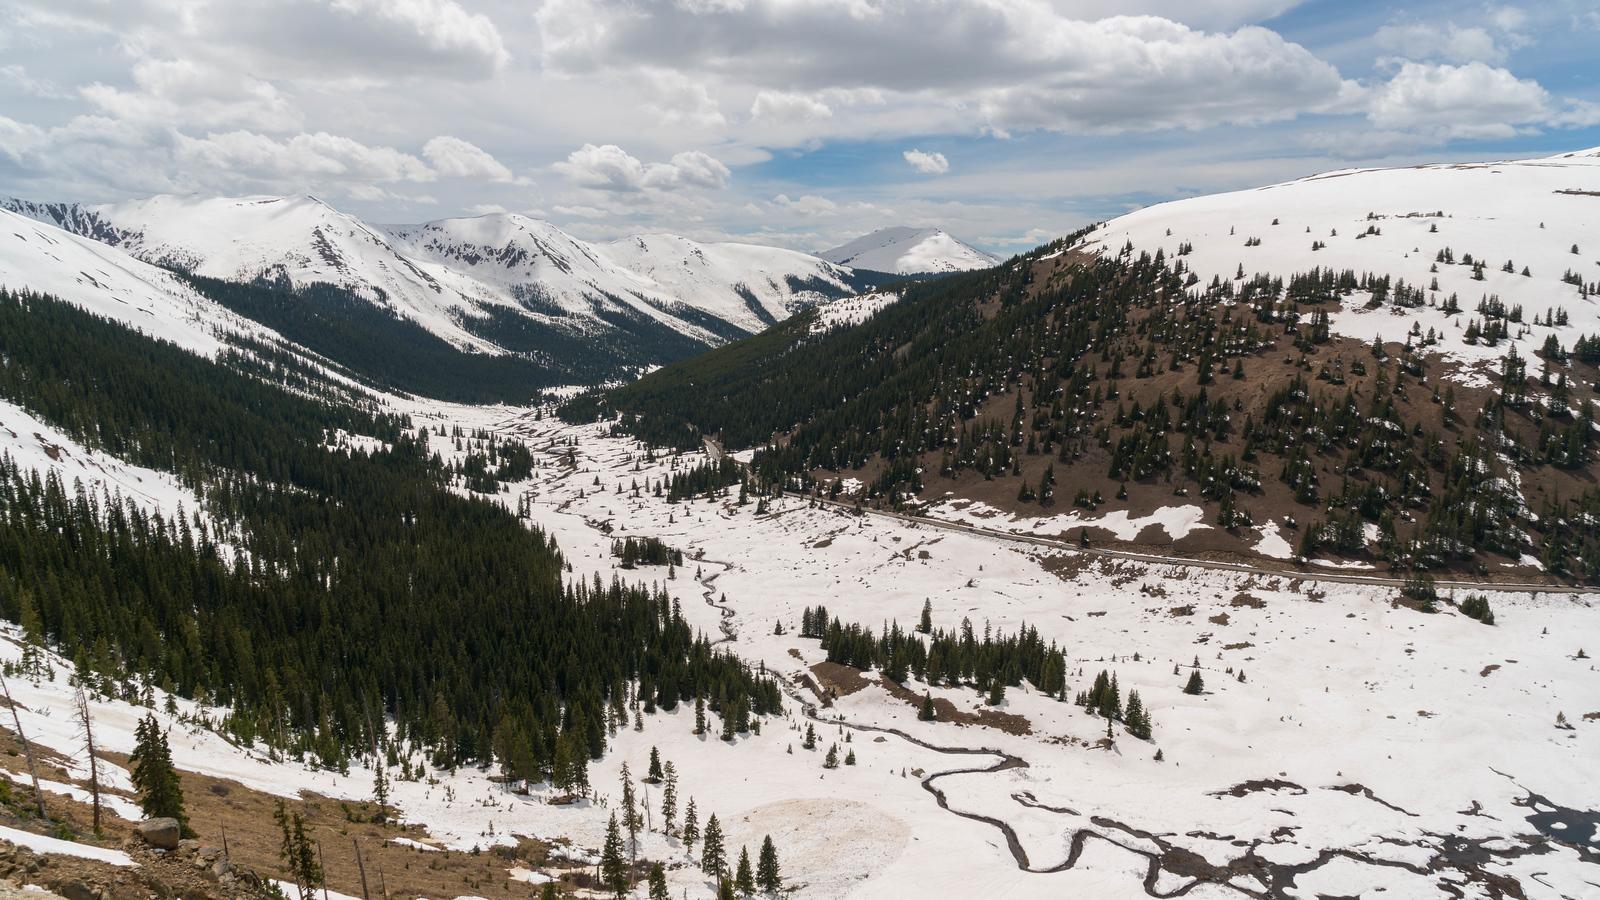 Winter sets in over the Colorado Rockies.